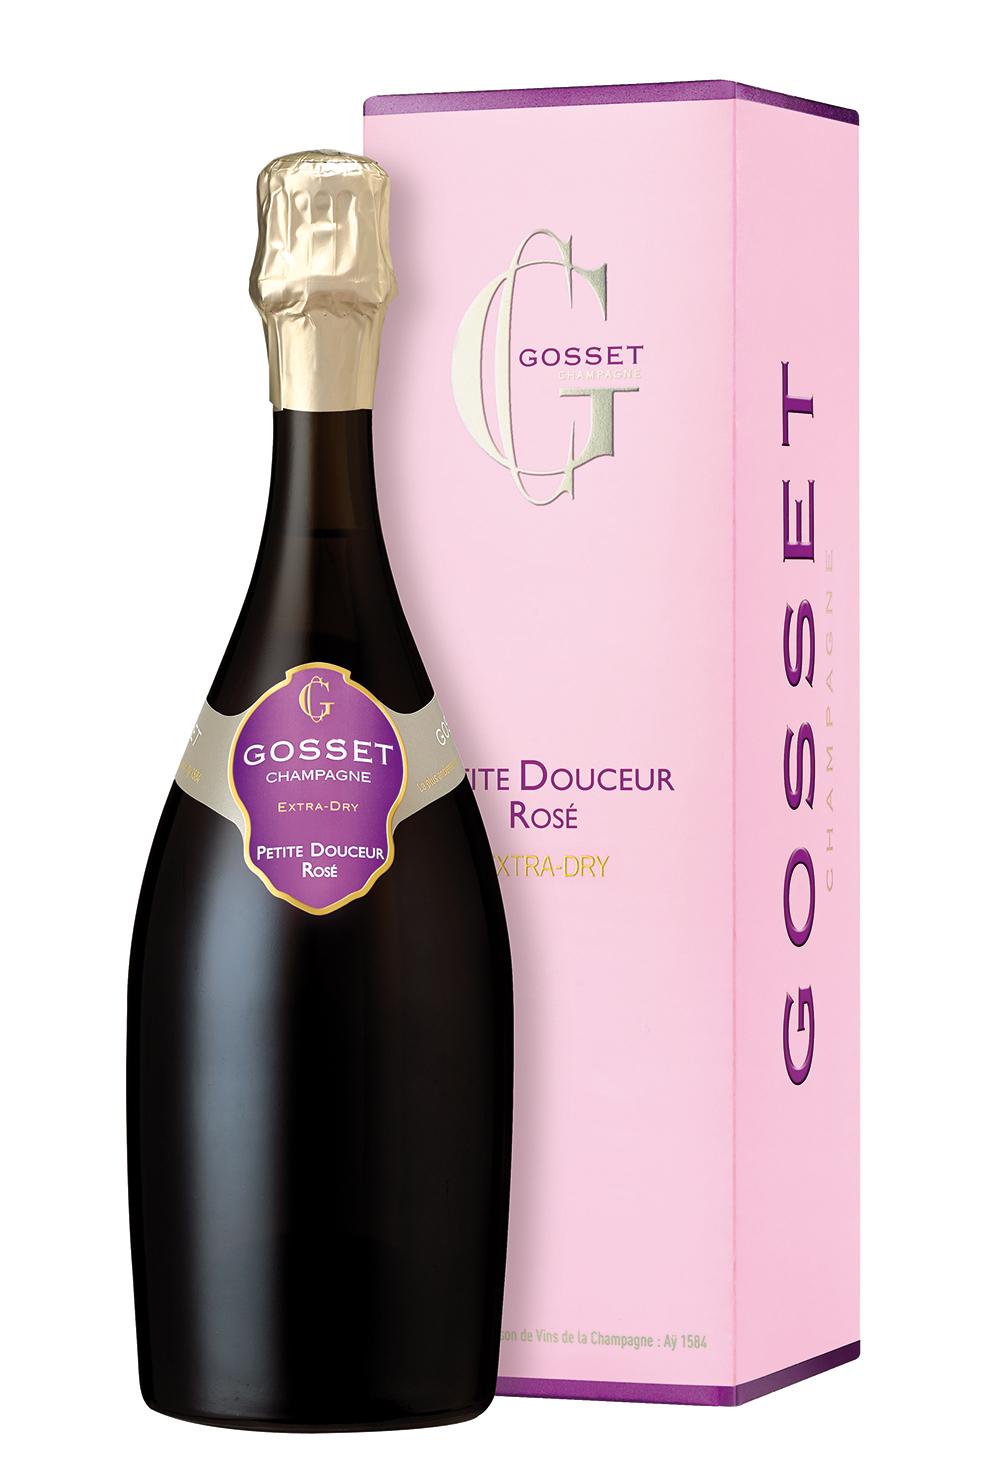 GOSSET_PETITE-DOUCEUR-ROSE